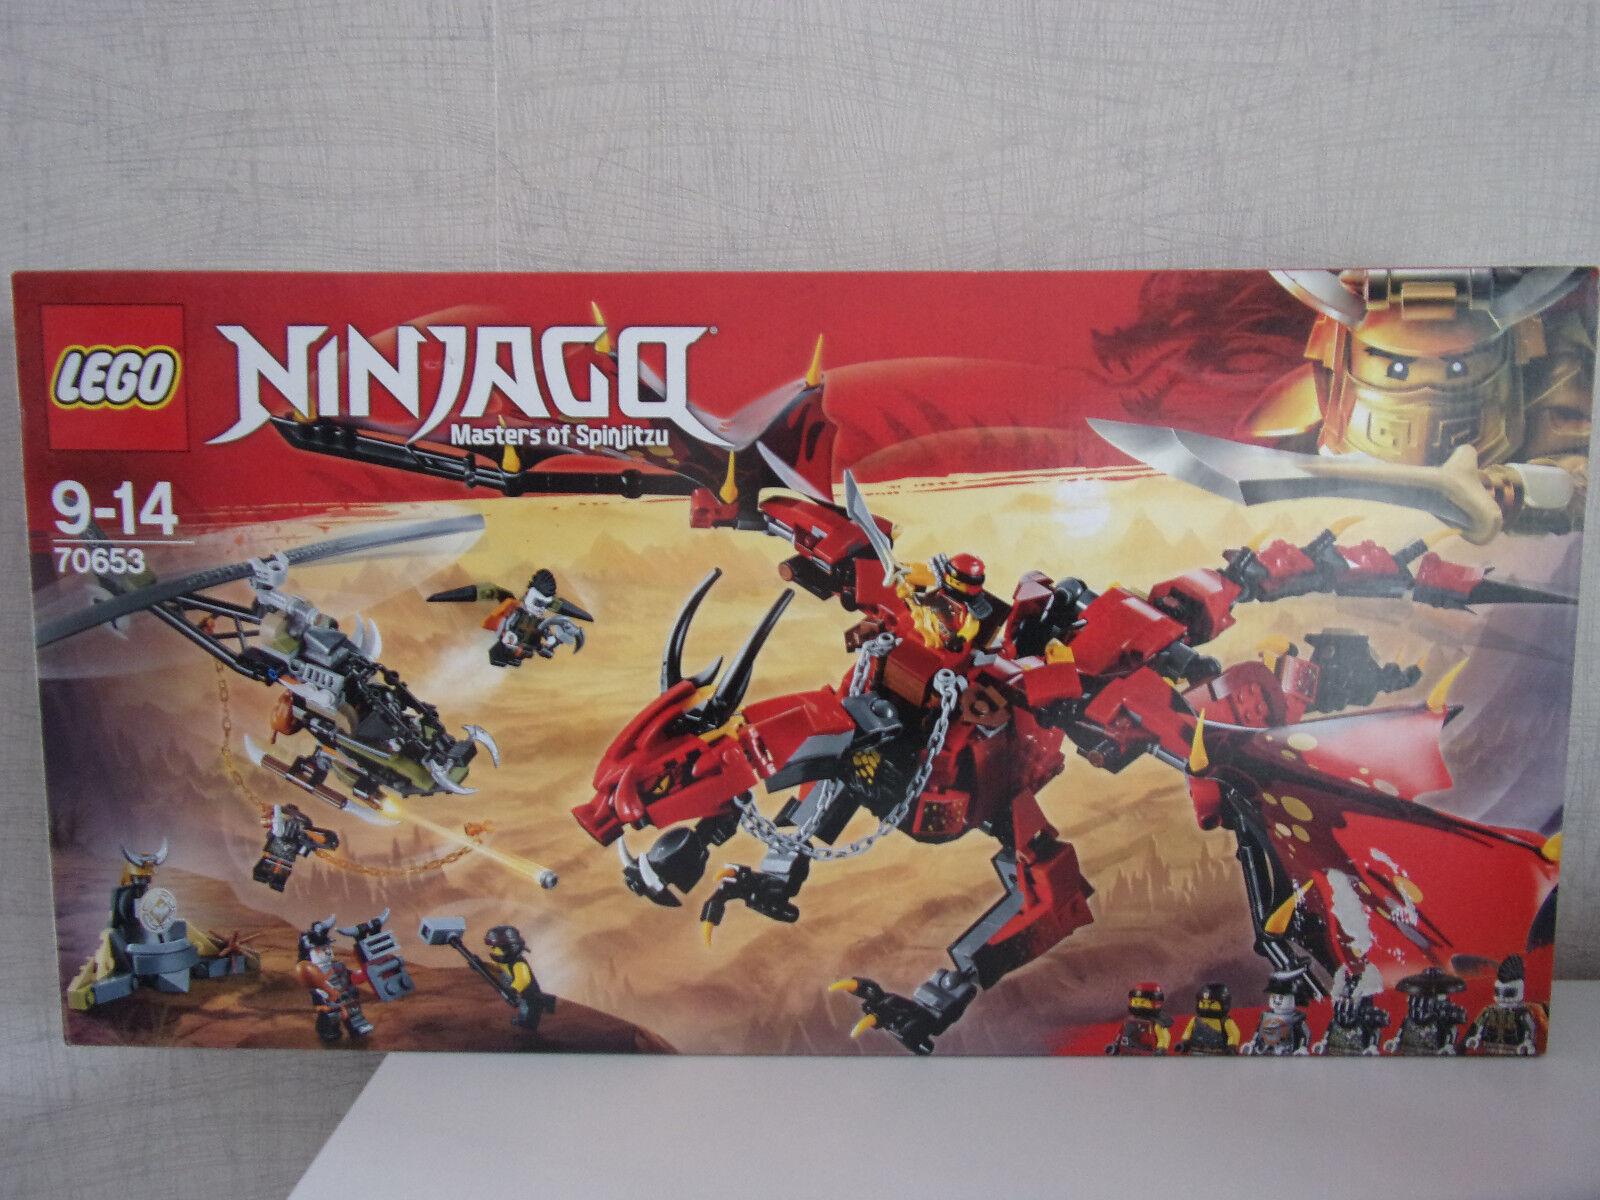 Lego Ninjago (Master of Spinjitzu) 70653 Mutter der Drachen - NEU (B-Ware)